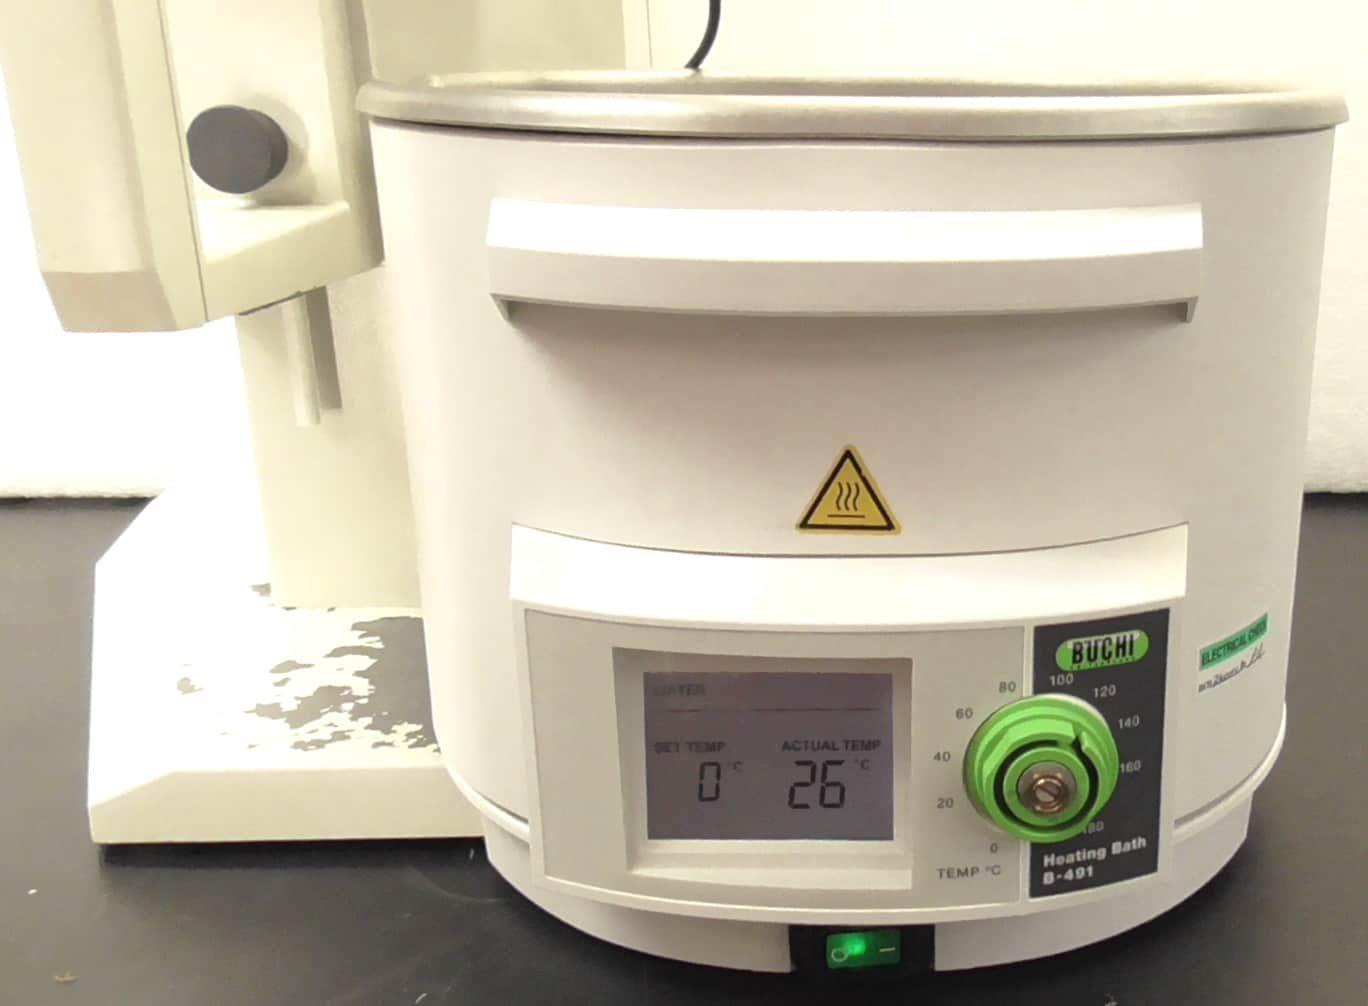 Buchi R-215 Rotary Evaporator with B-491 Heating Bath and V-855 Vacuum Controller